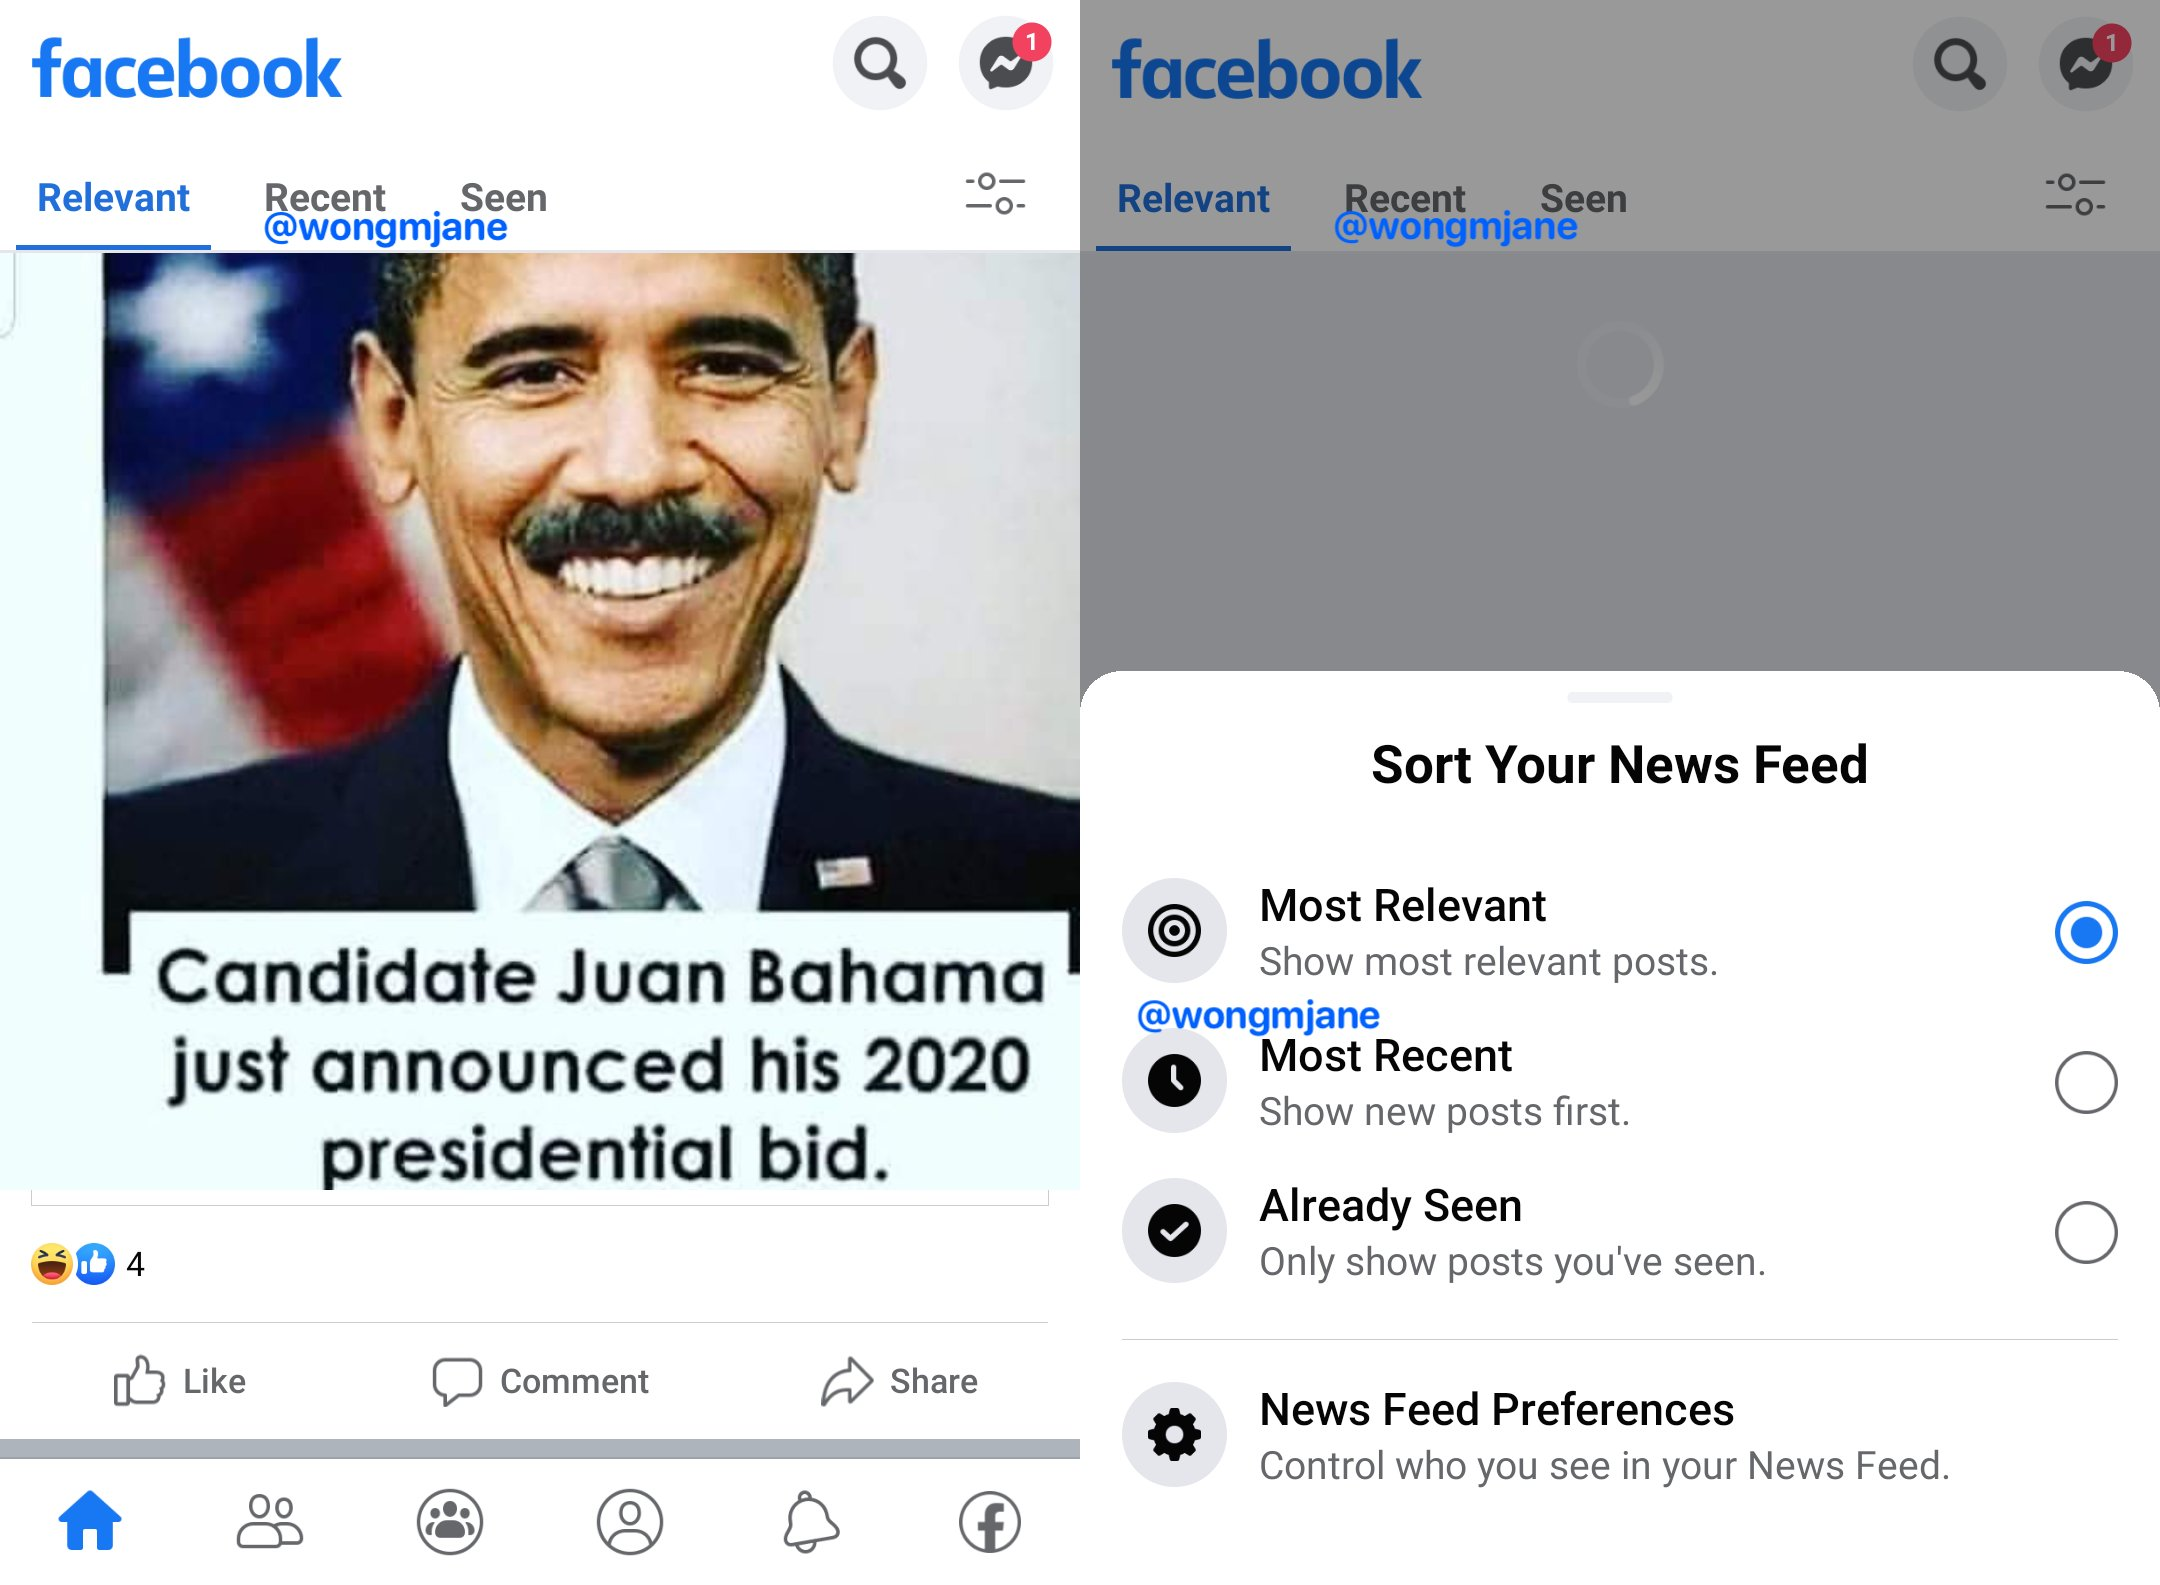 Facebook secara internal menguji peralihan yang mudah antara urutan Umpan Berita berurutan, kronologis, dan algoritmik 2